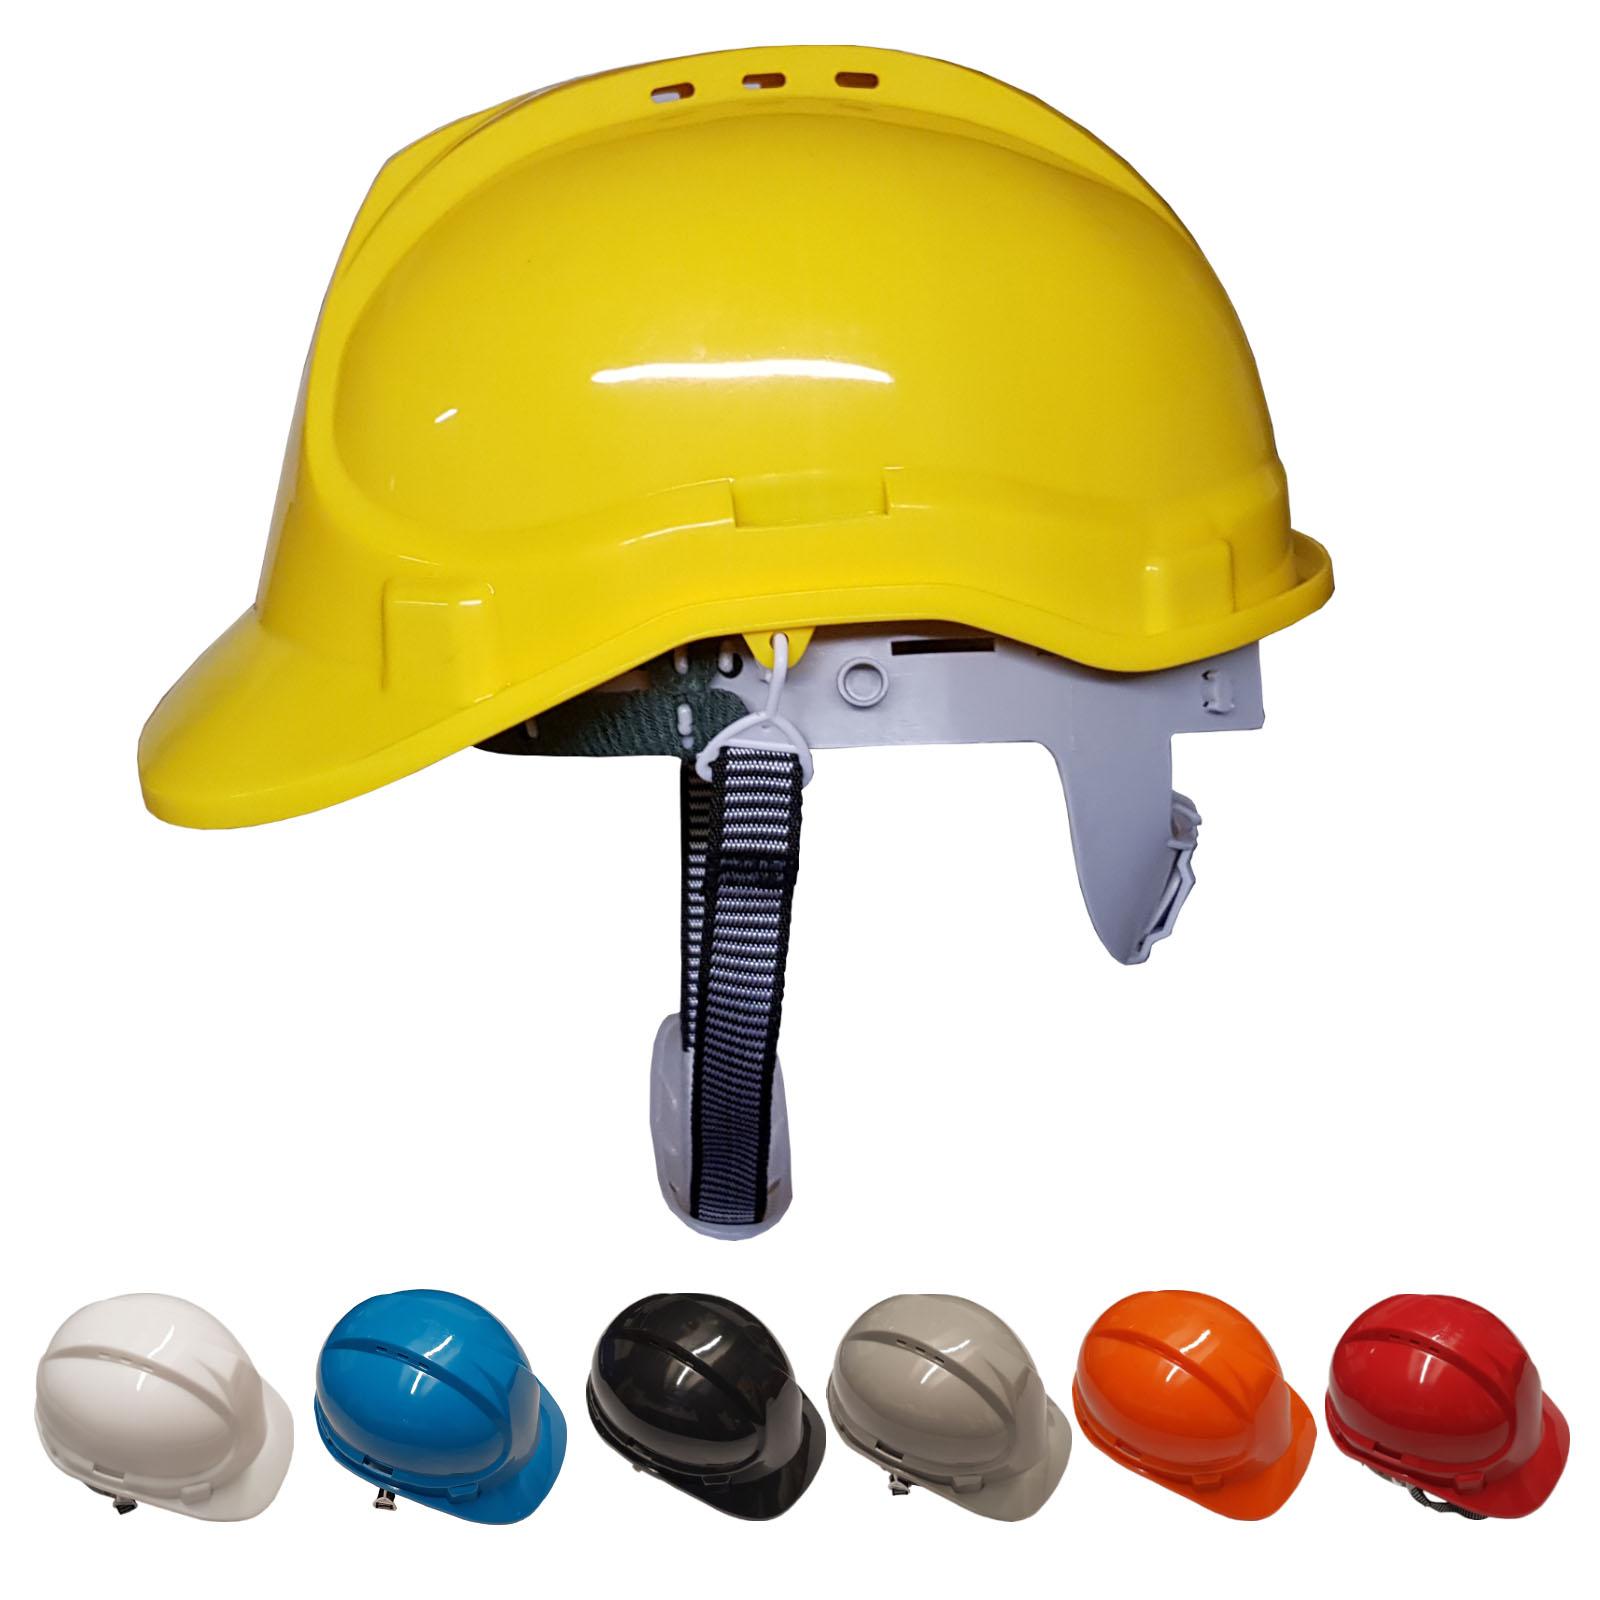 8 Point Safety Helmet Hard Hat Chin Strap – Pin lock